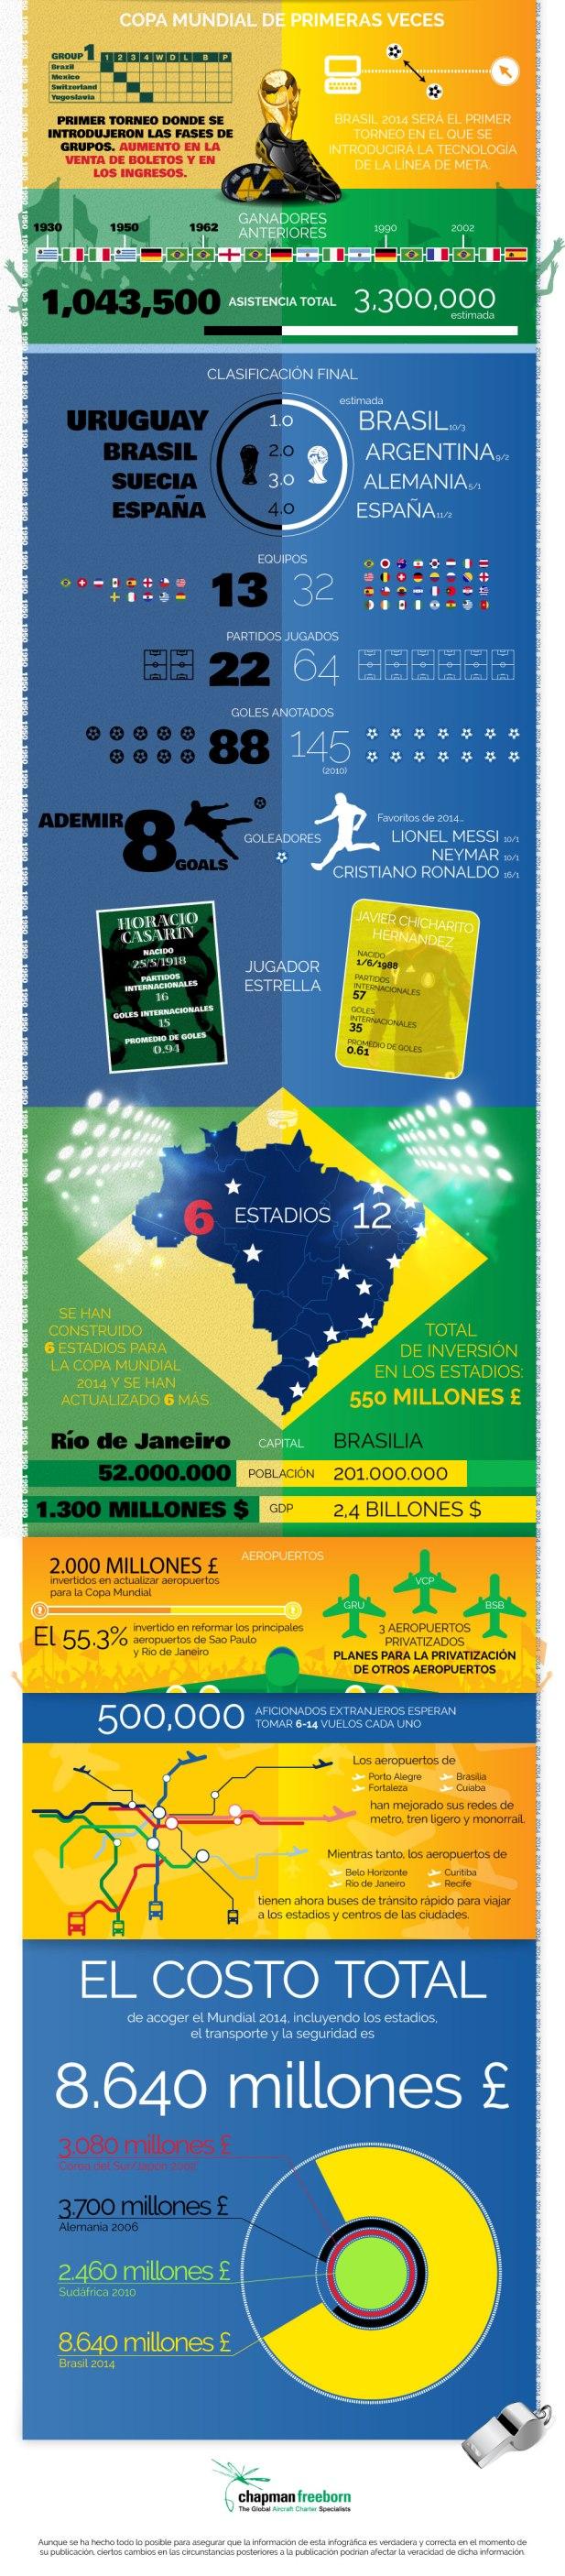 http://www.futbolsapiens.com/wp-content/uploads/2014/05/infographic-mundial.jpg